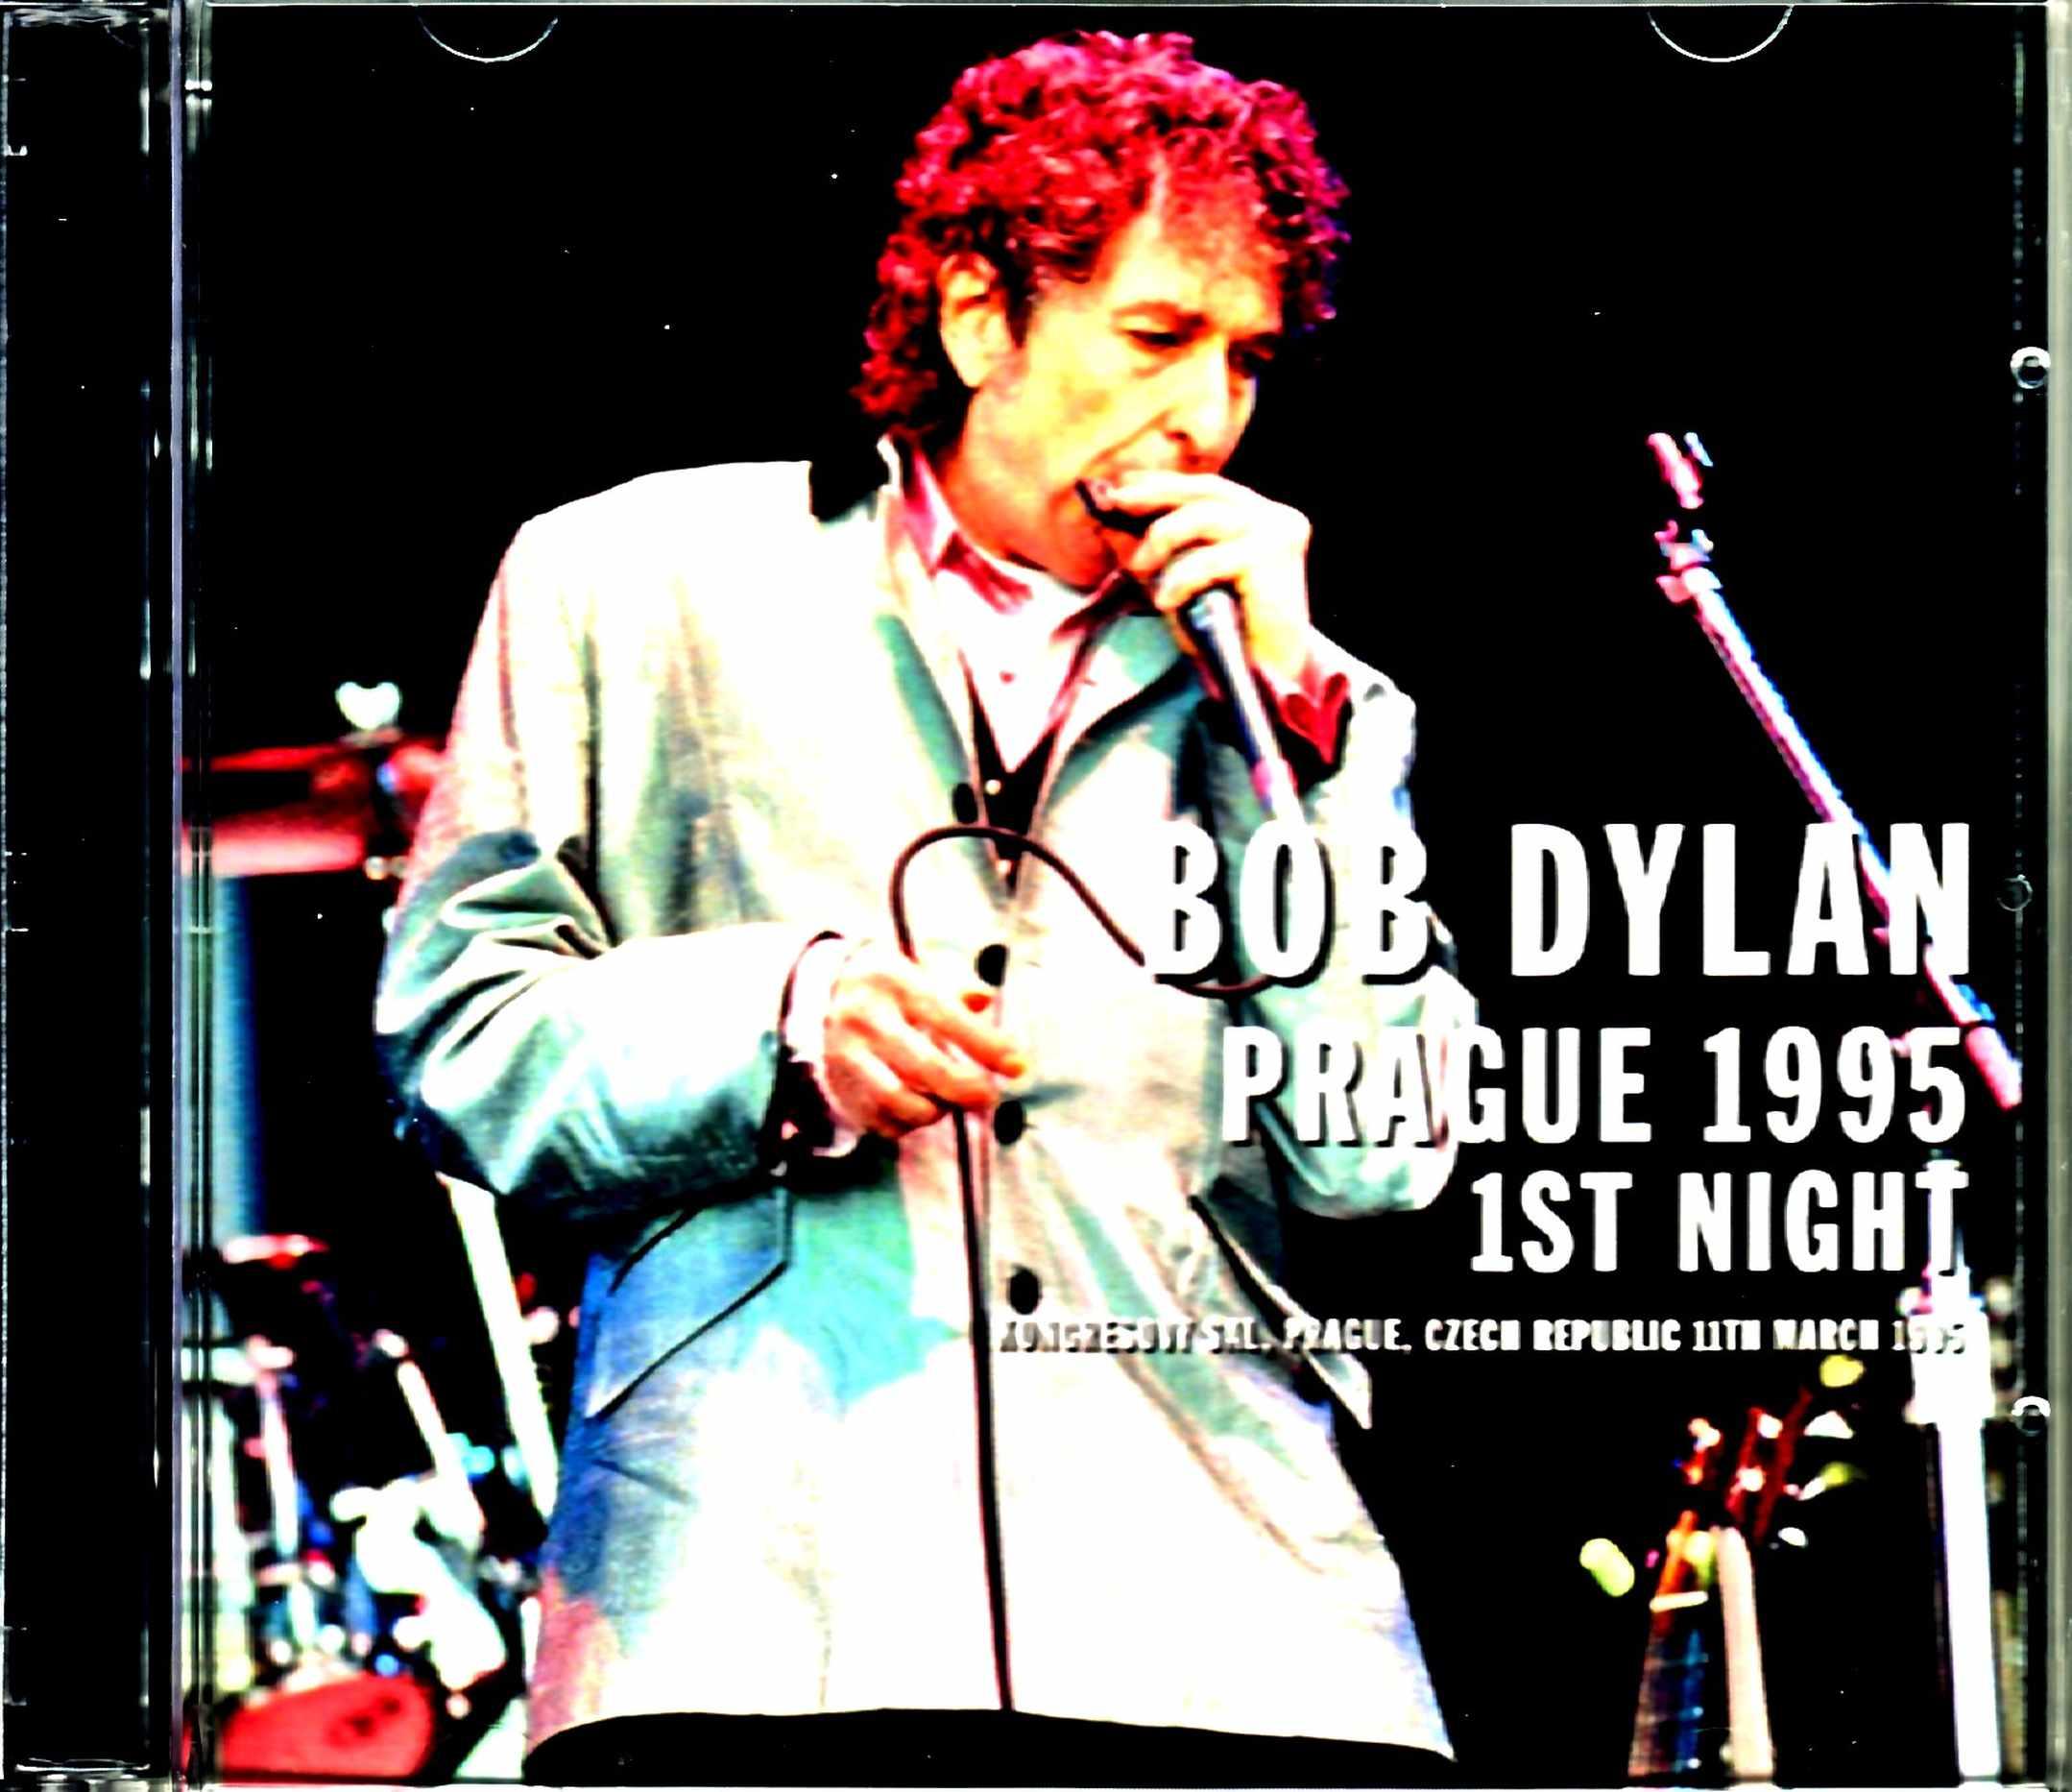 Bob Dylan ボブ・ディラン/Czech Republic 3.11.1995